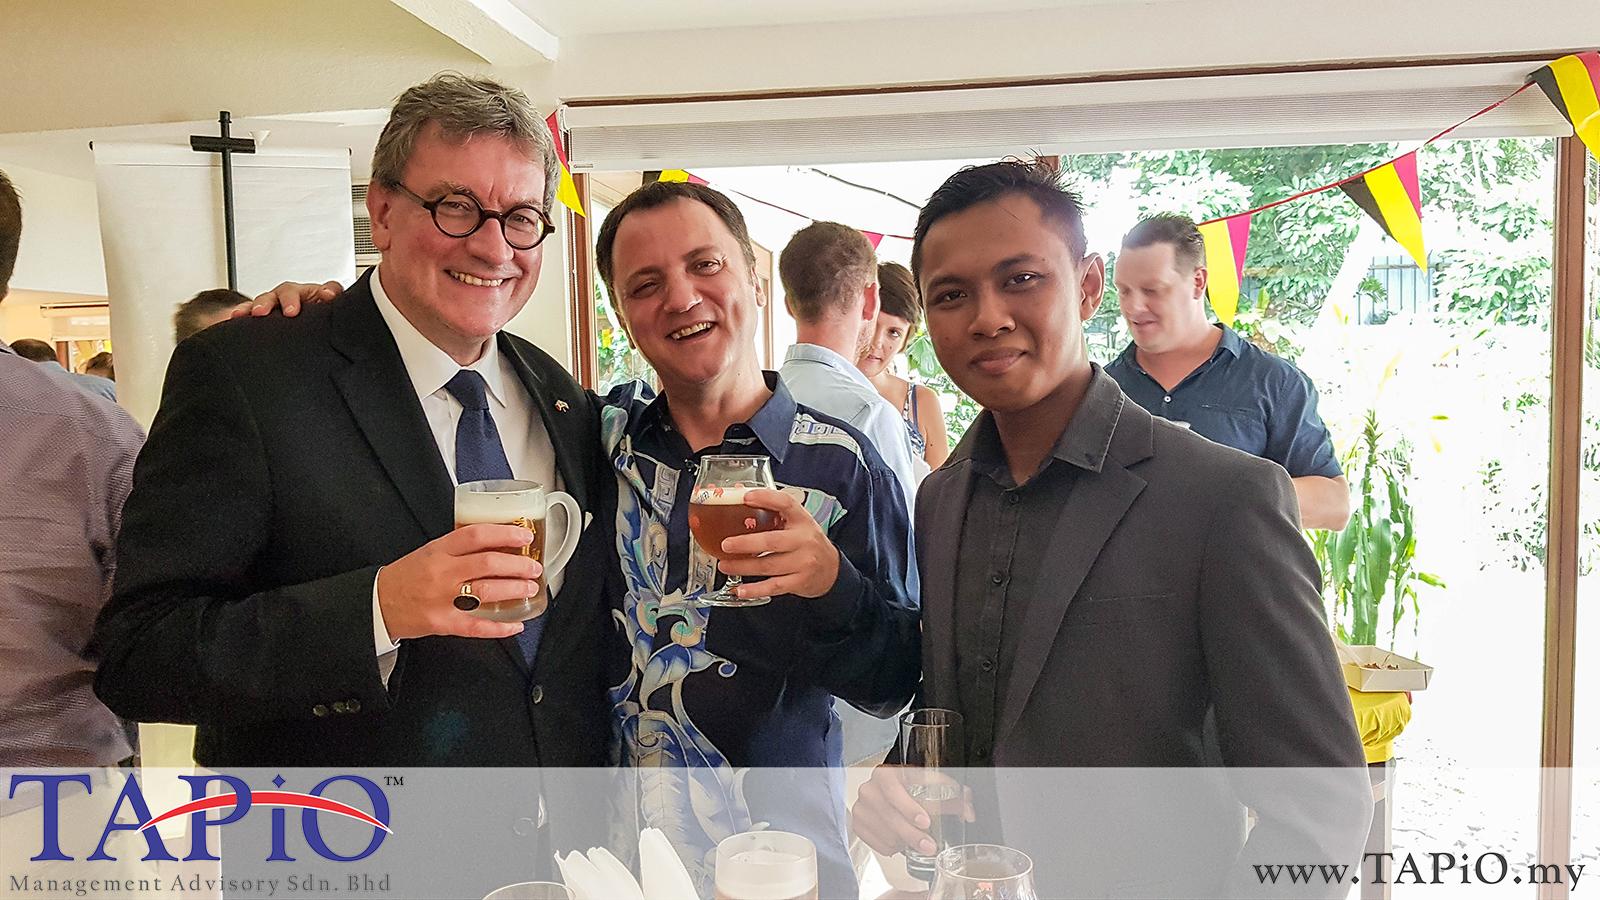 King's Day of Belgium - 21/07/2019